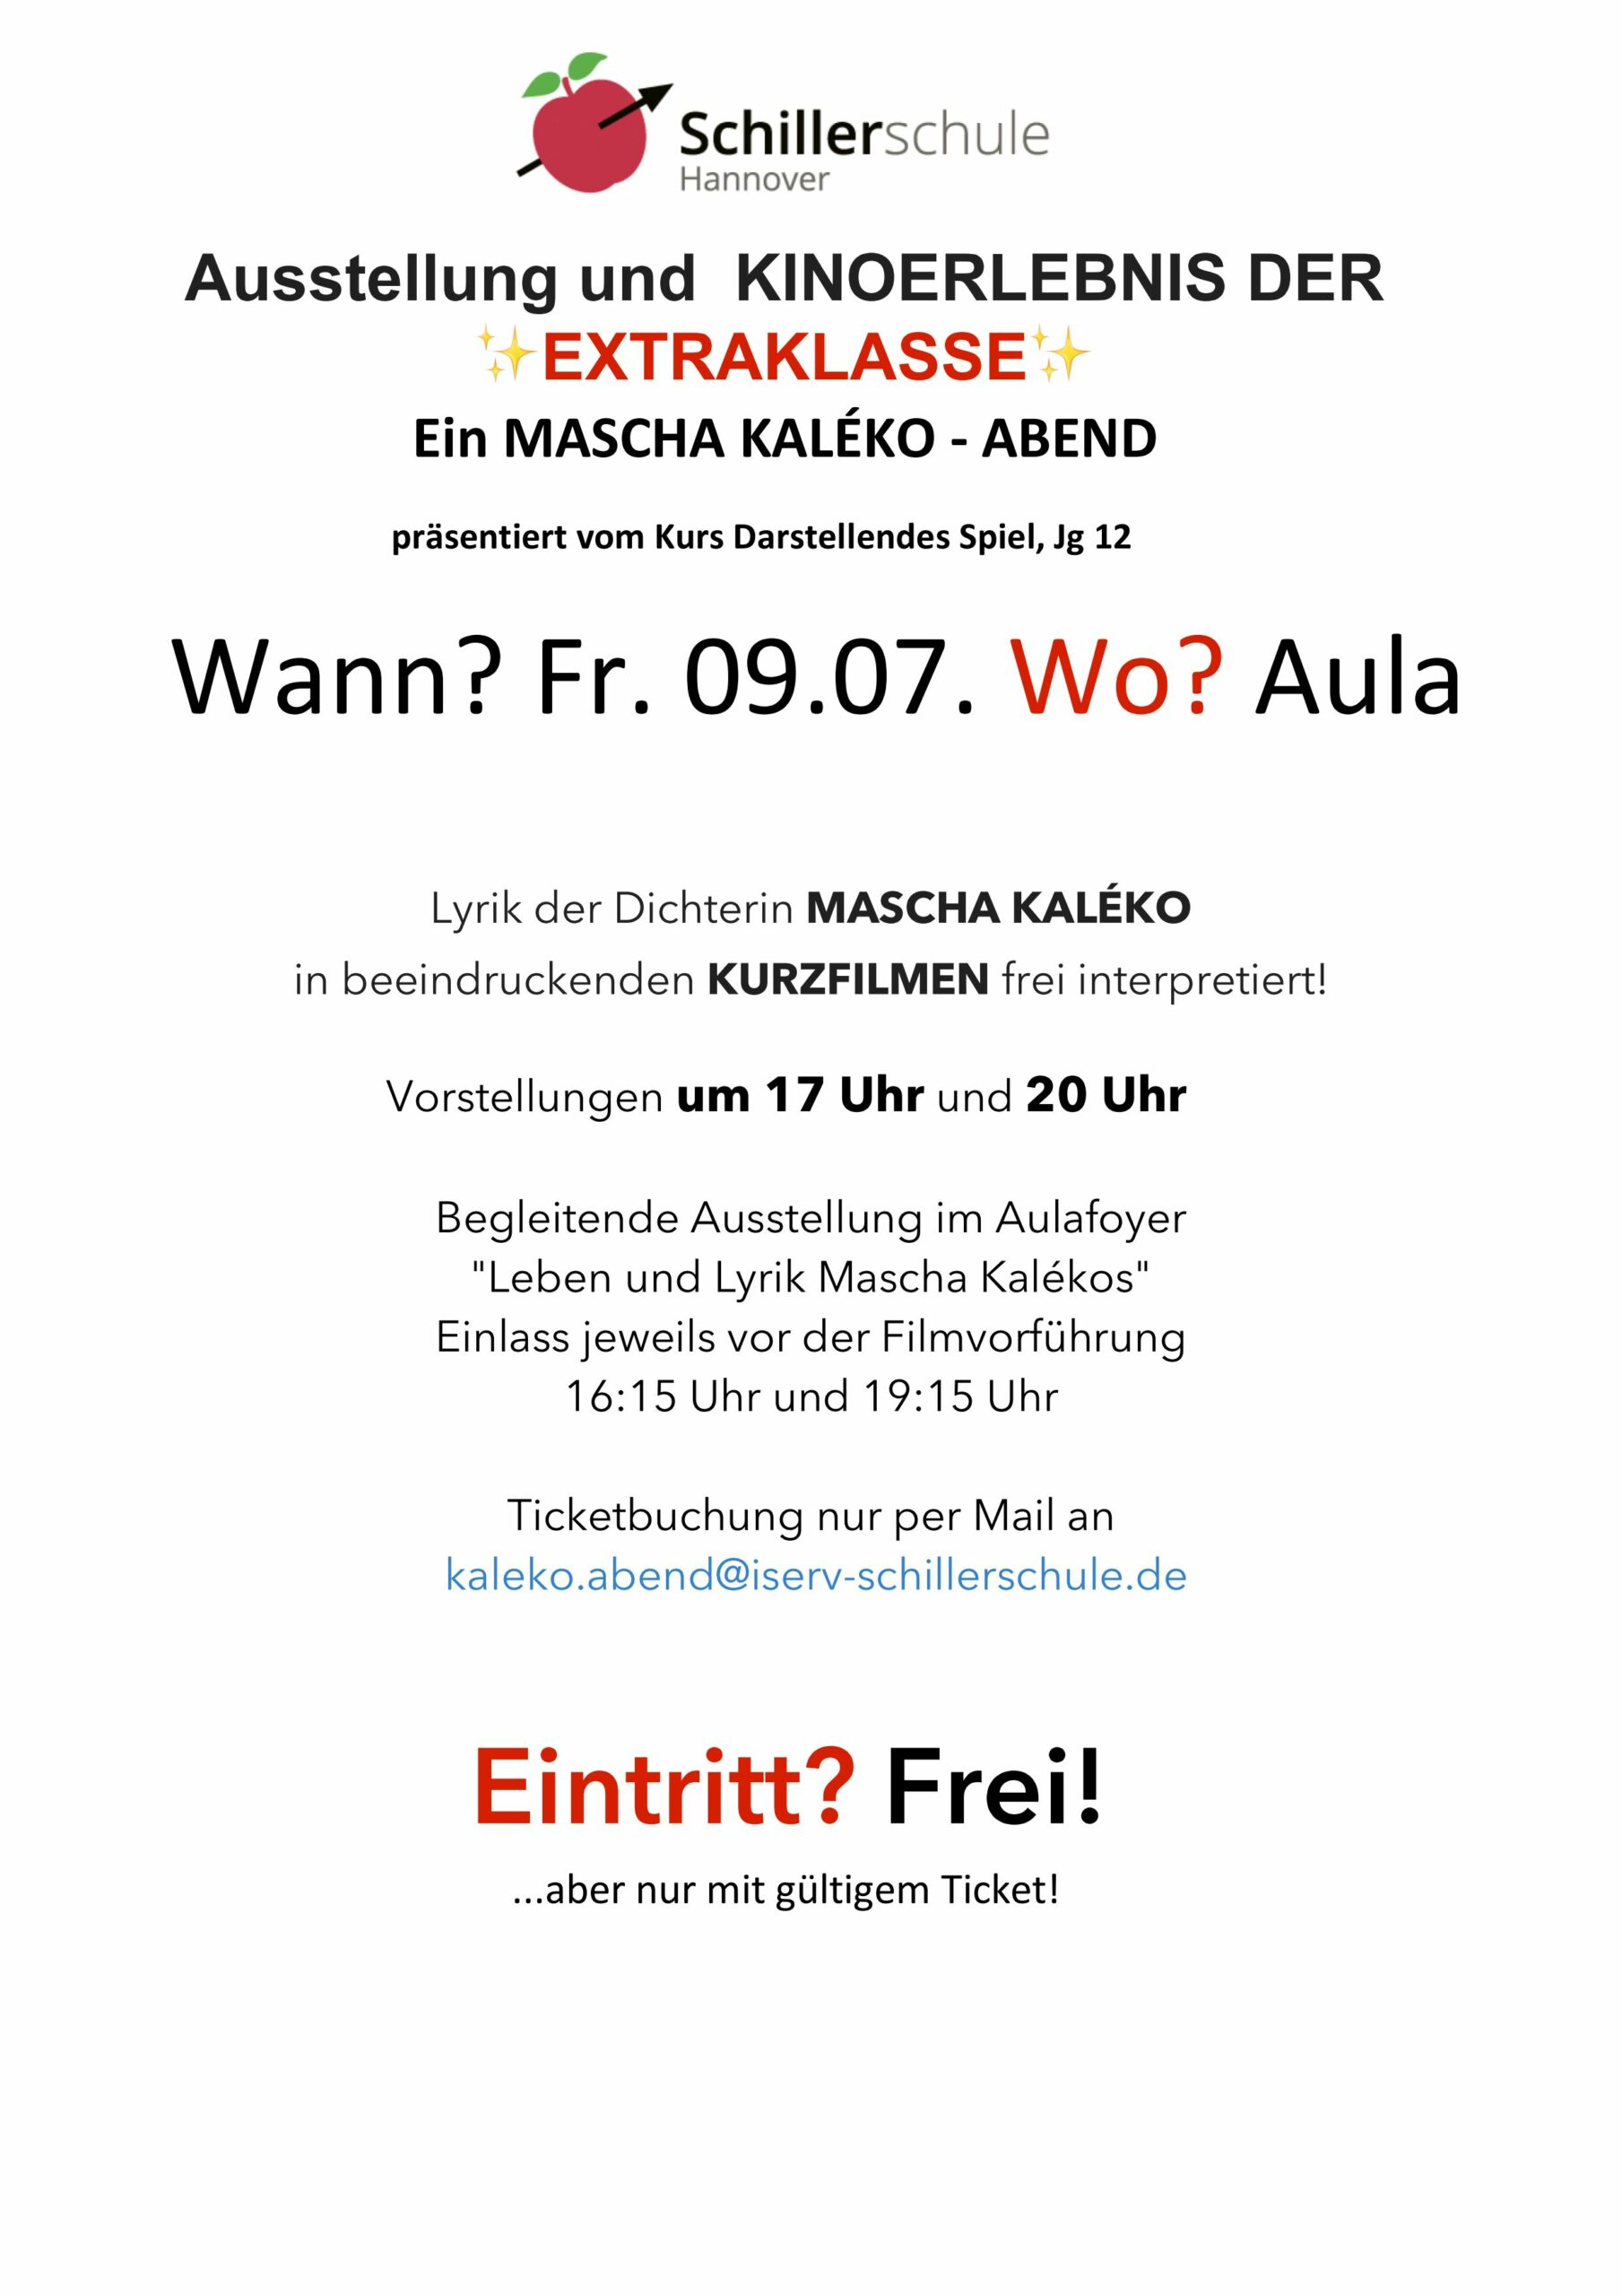 Plakatankündigung: Mascha Kaleko Abend